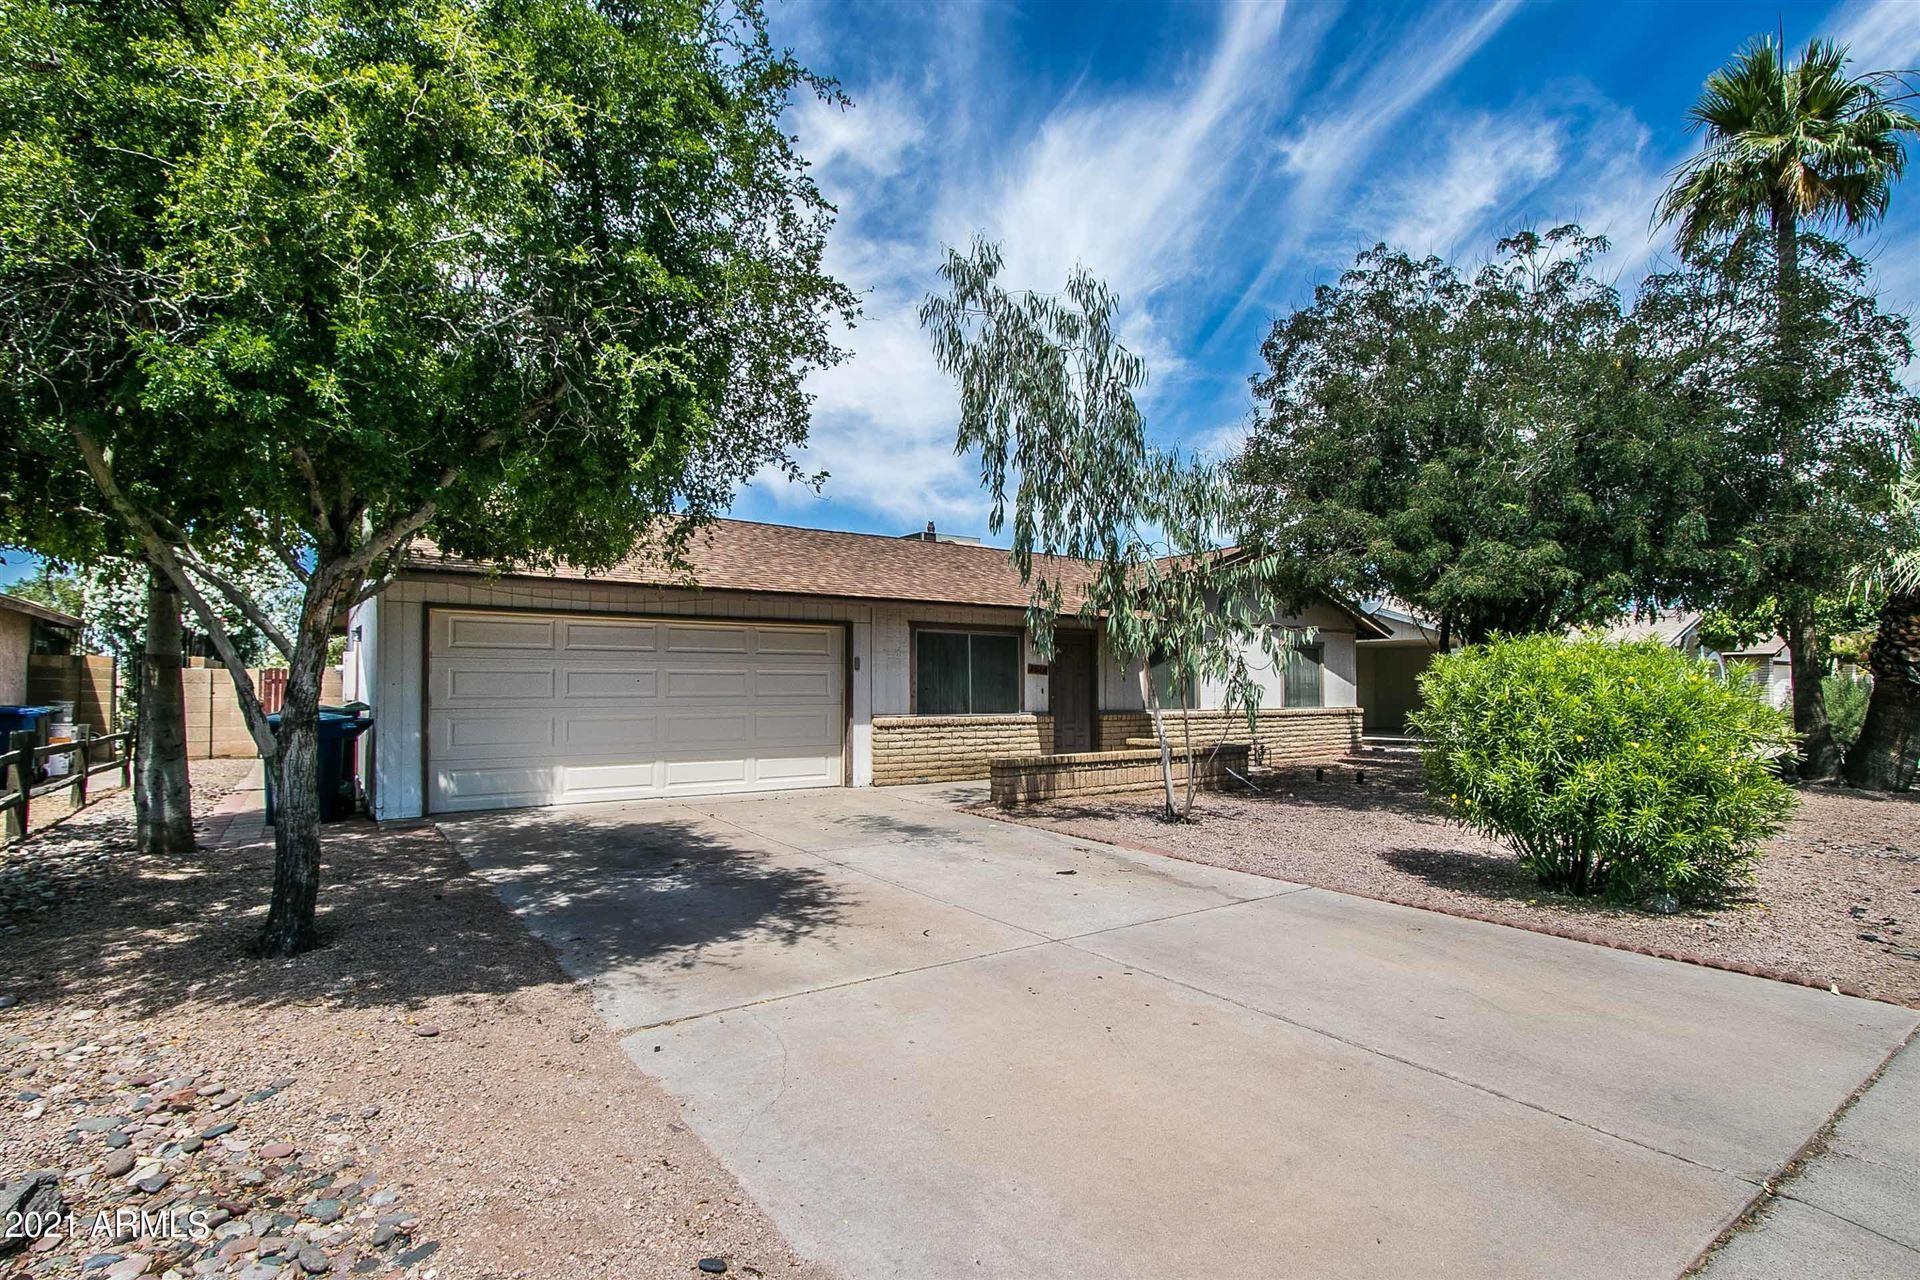 Photo of 2514 S COTTONWOOD Drive, Tempe, AZ 85282 (MLS # 6272409)